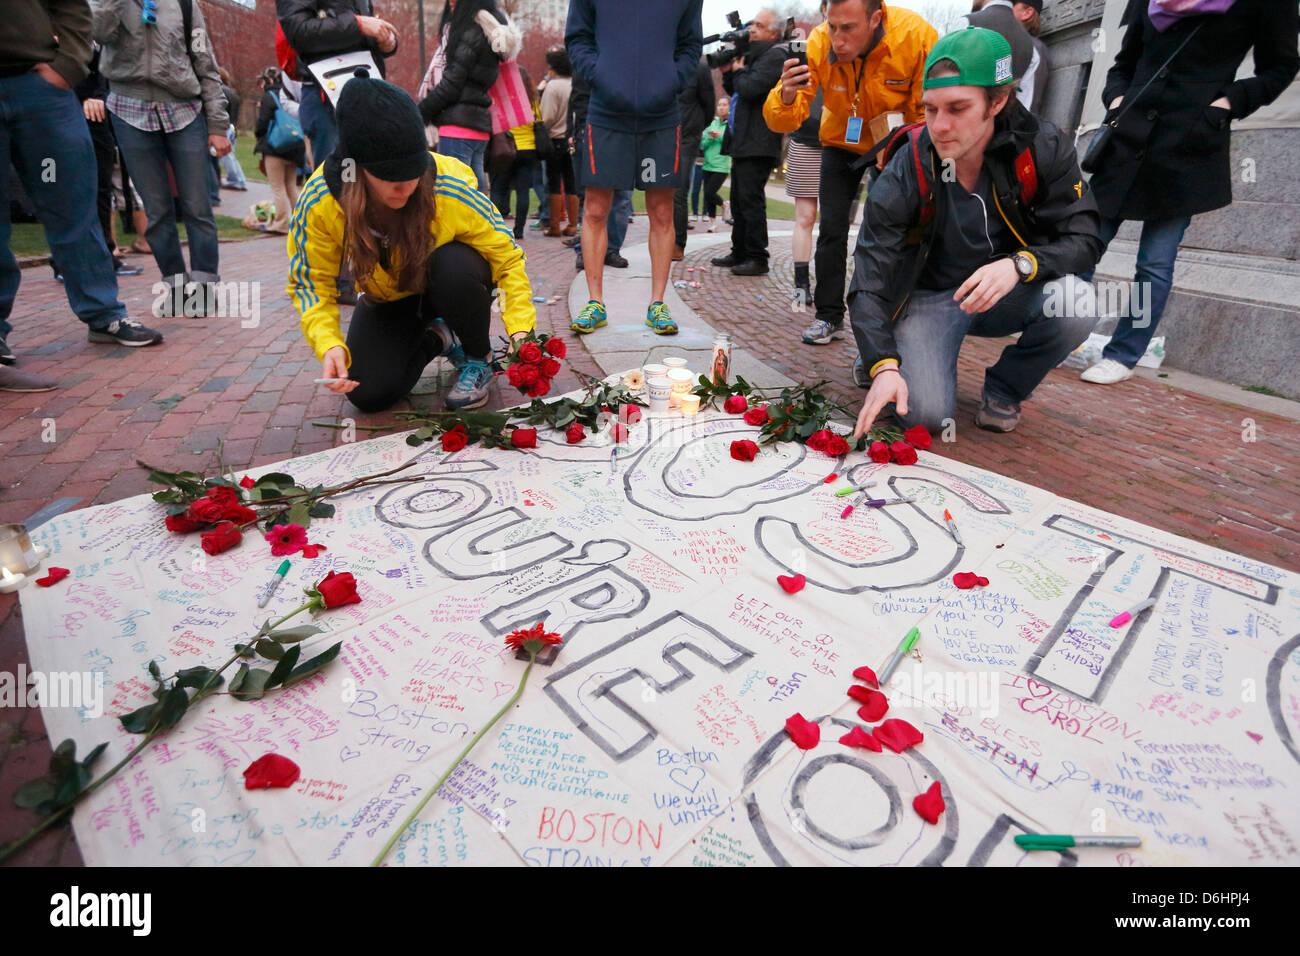 Candlelight vigil on Boston Common  following explosions at the finish line of the Boston Marathon - Stock Image